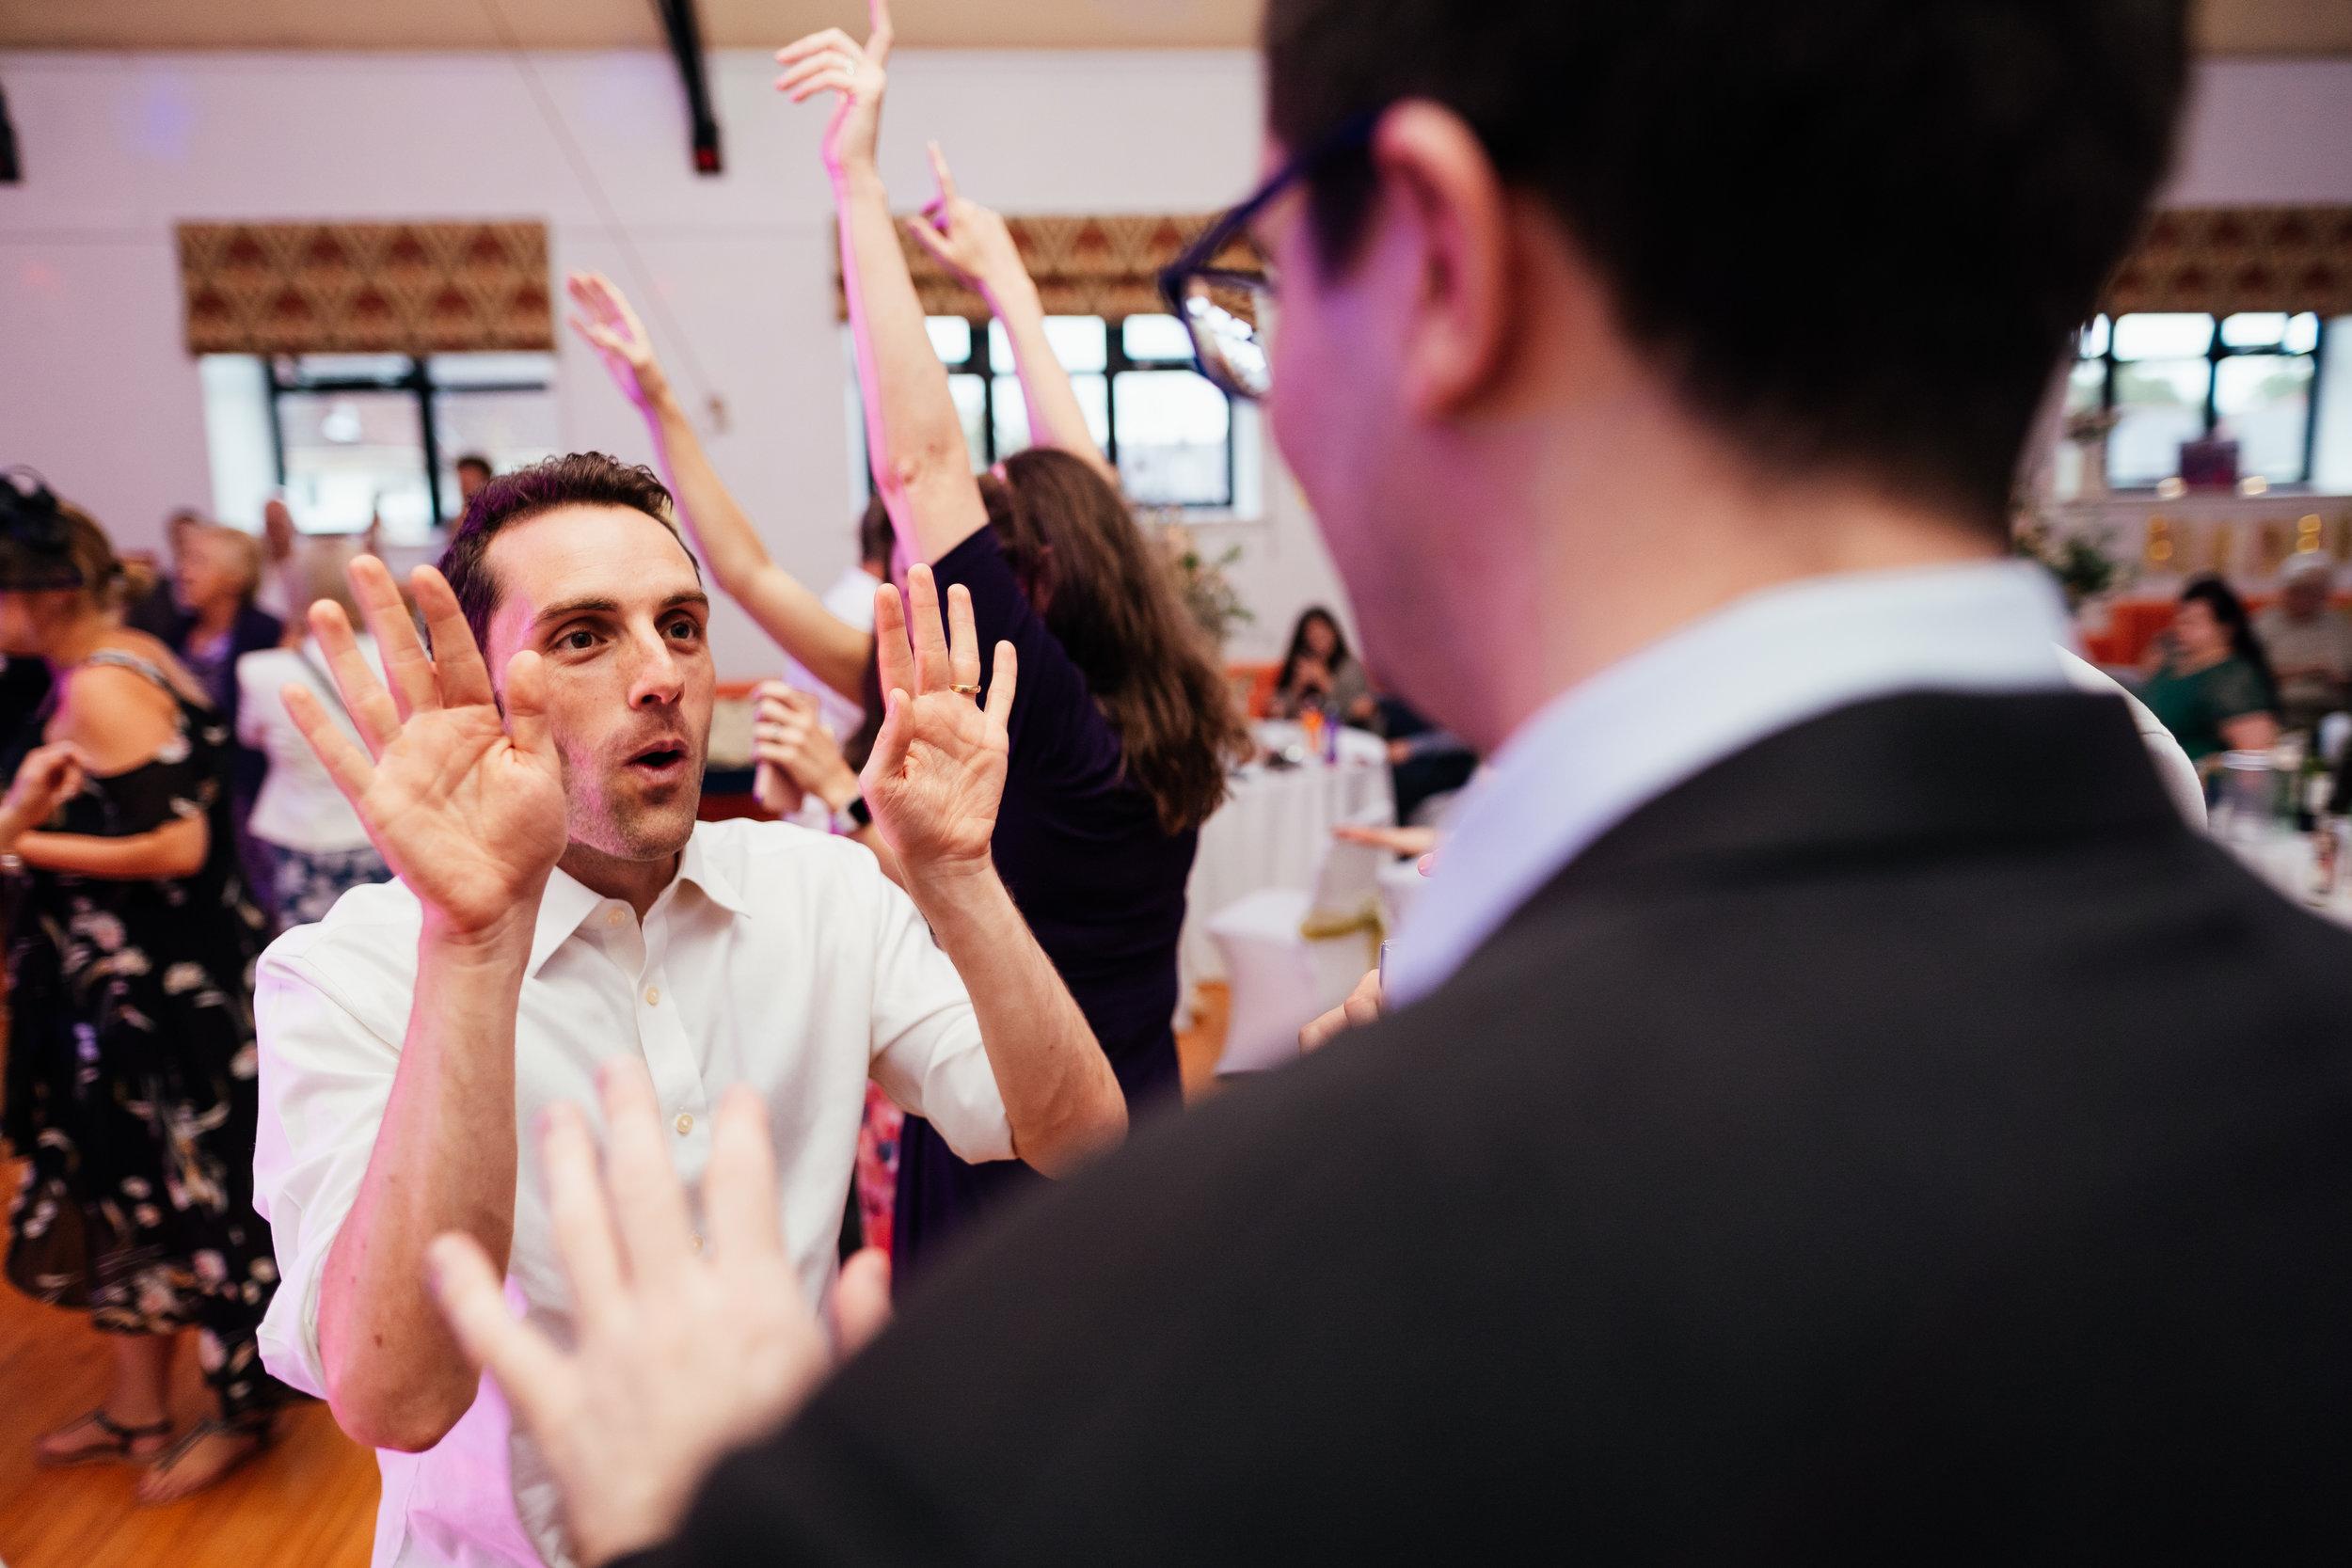 st-georges-hall-liverpool-wedding-349.jpg